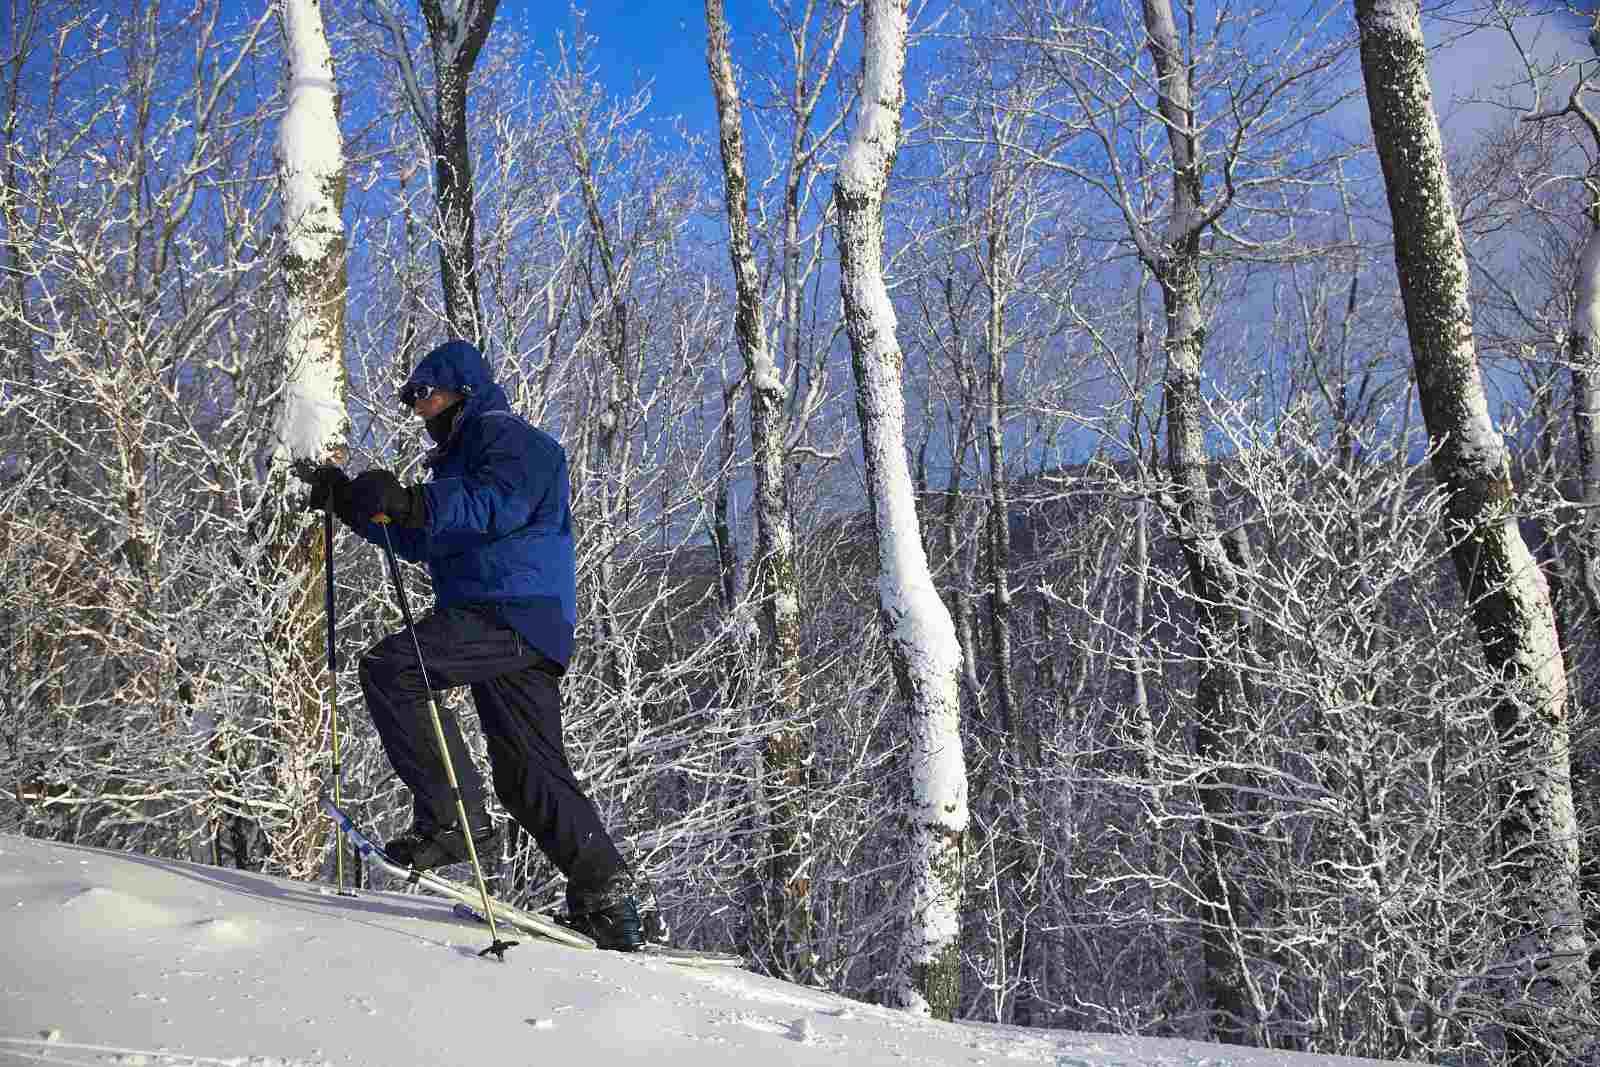 Snowshoeing Montreal 2017 season details for Parc-nature Pointe-aux-Prairies.